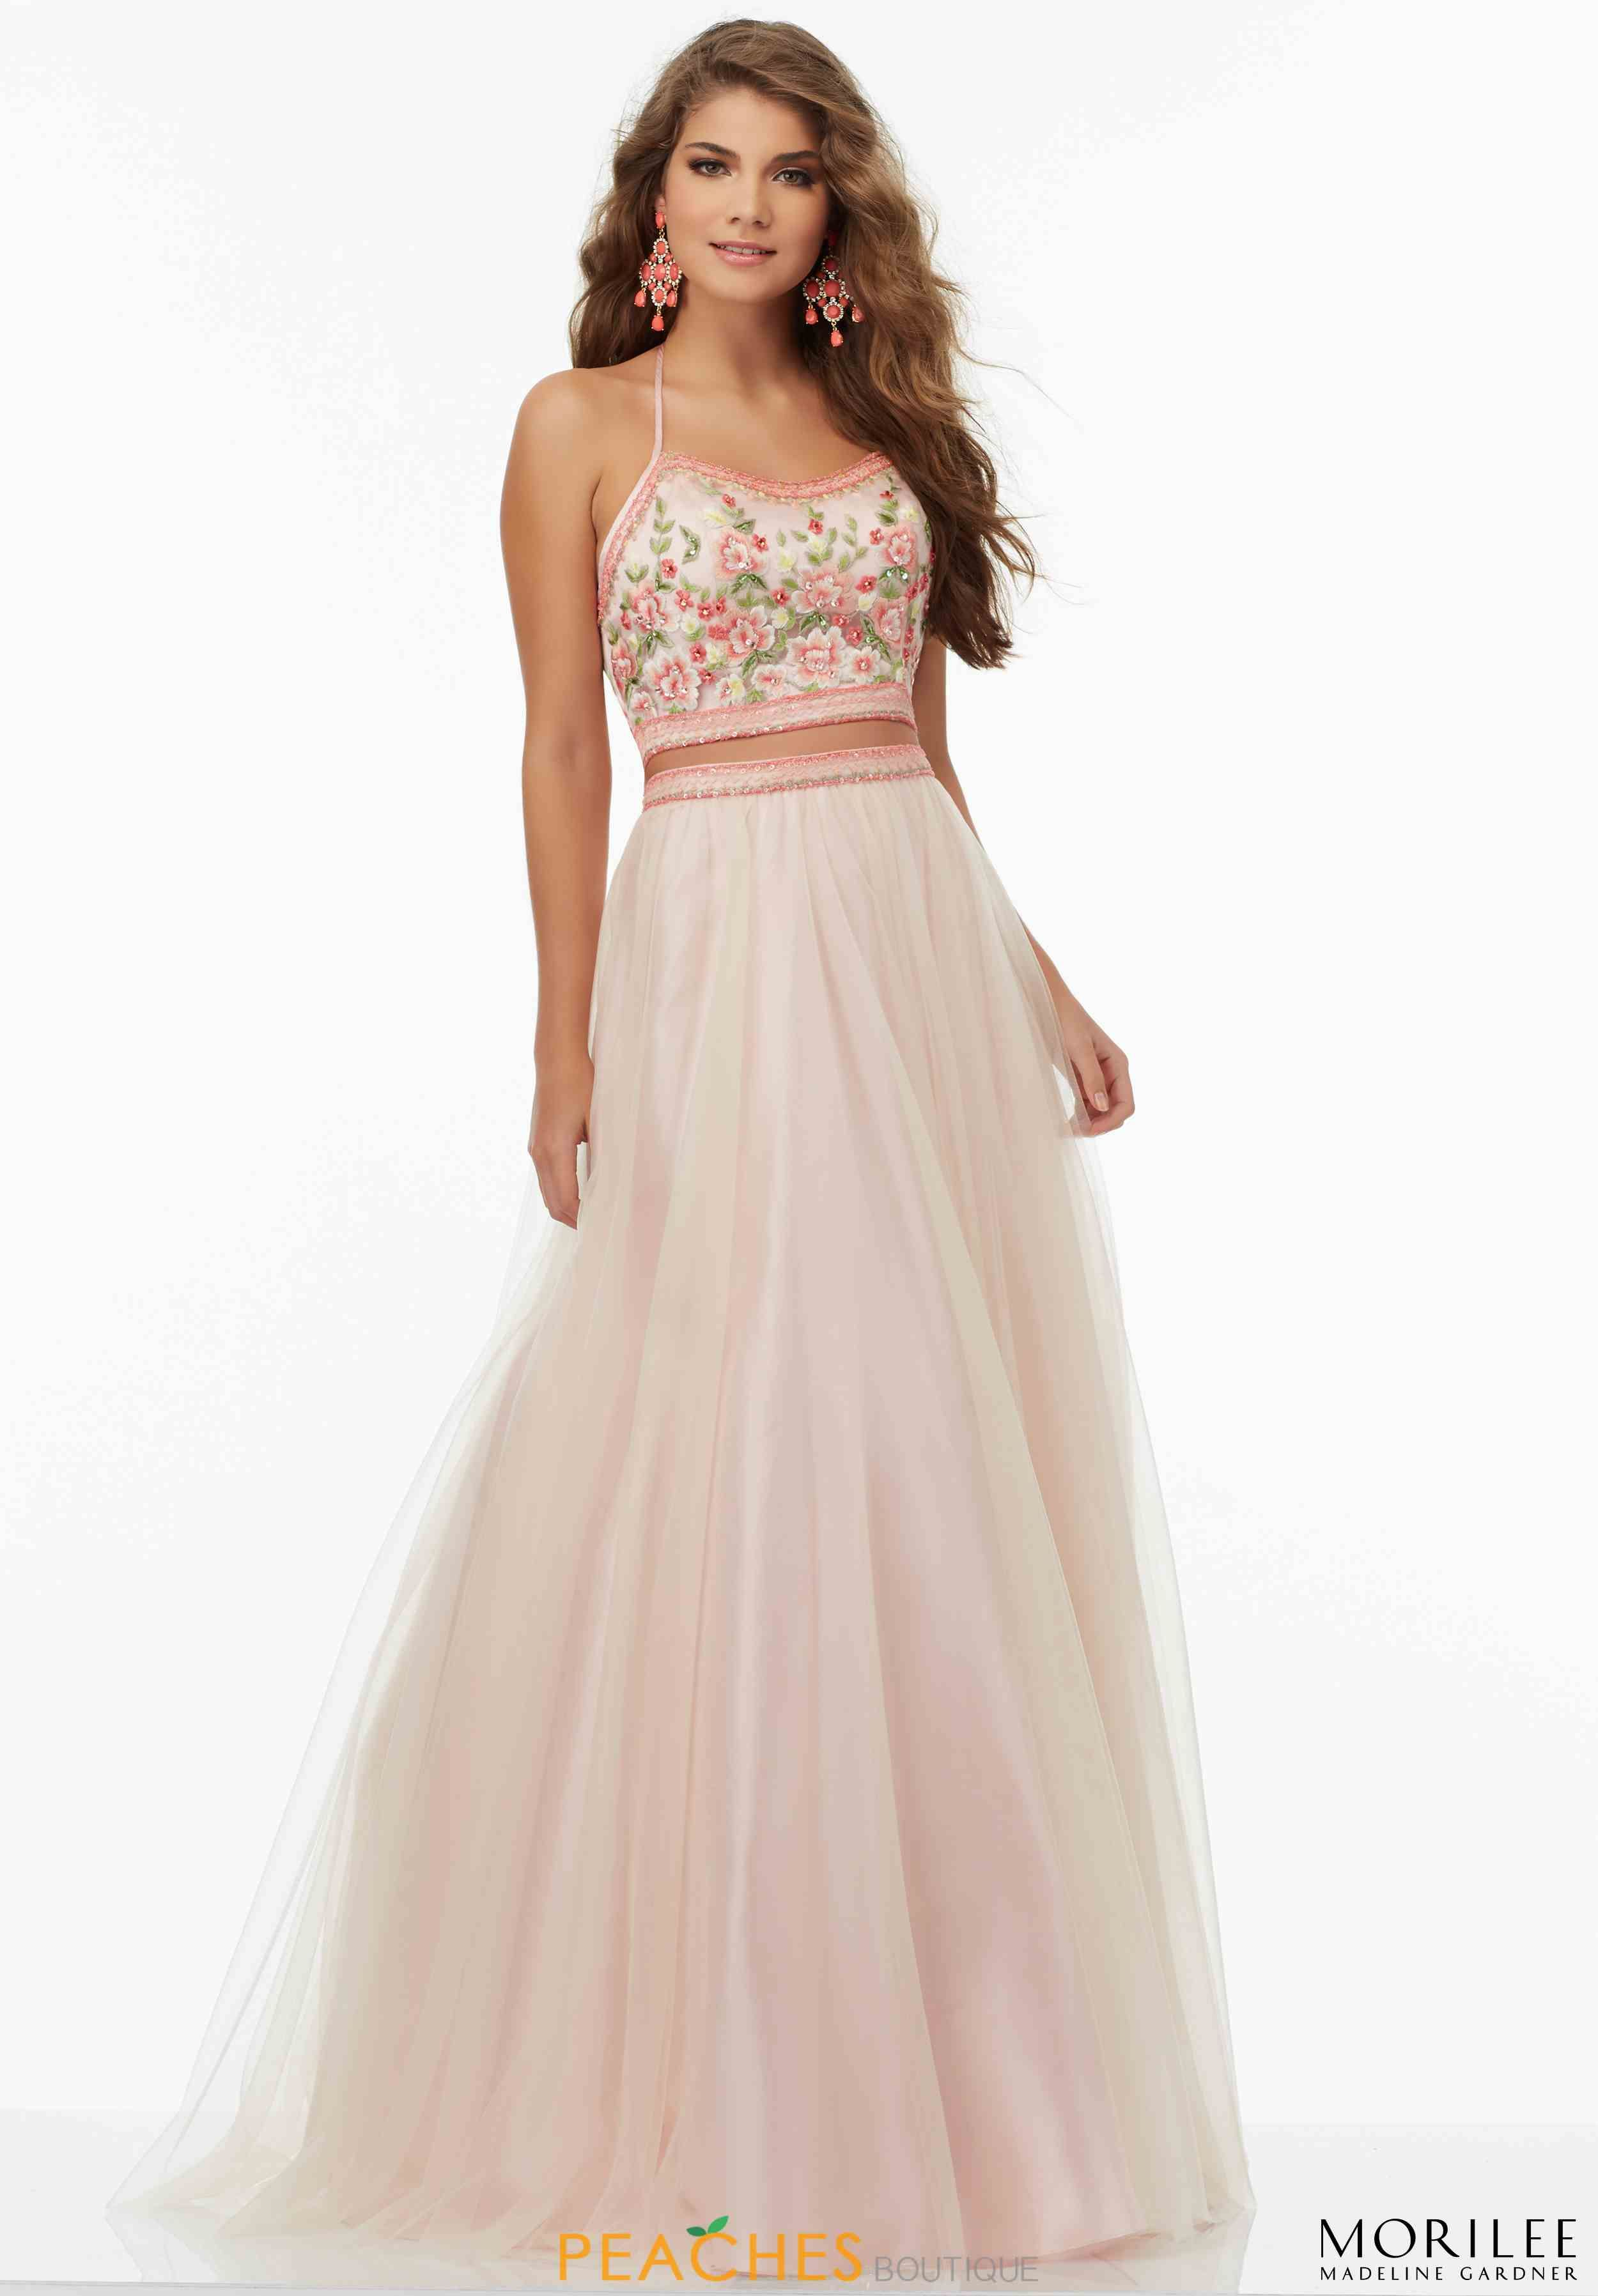 929cd47b5c5 2017 Quinceanera Dresses Peaches Boutique - Gomes Weine AG